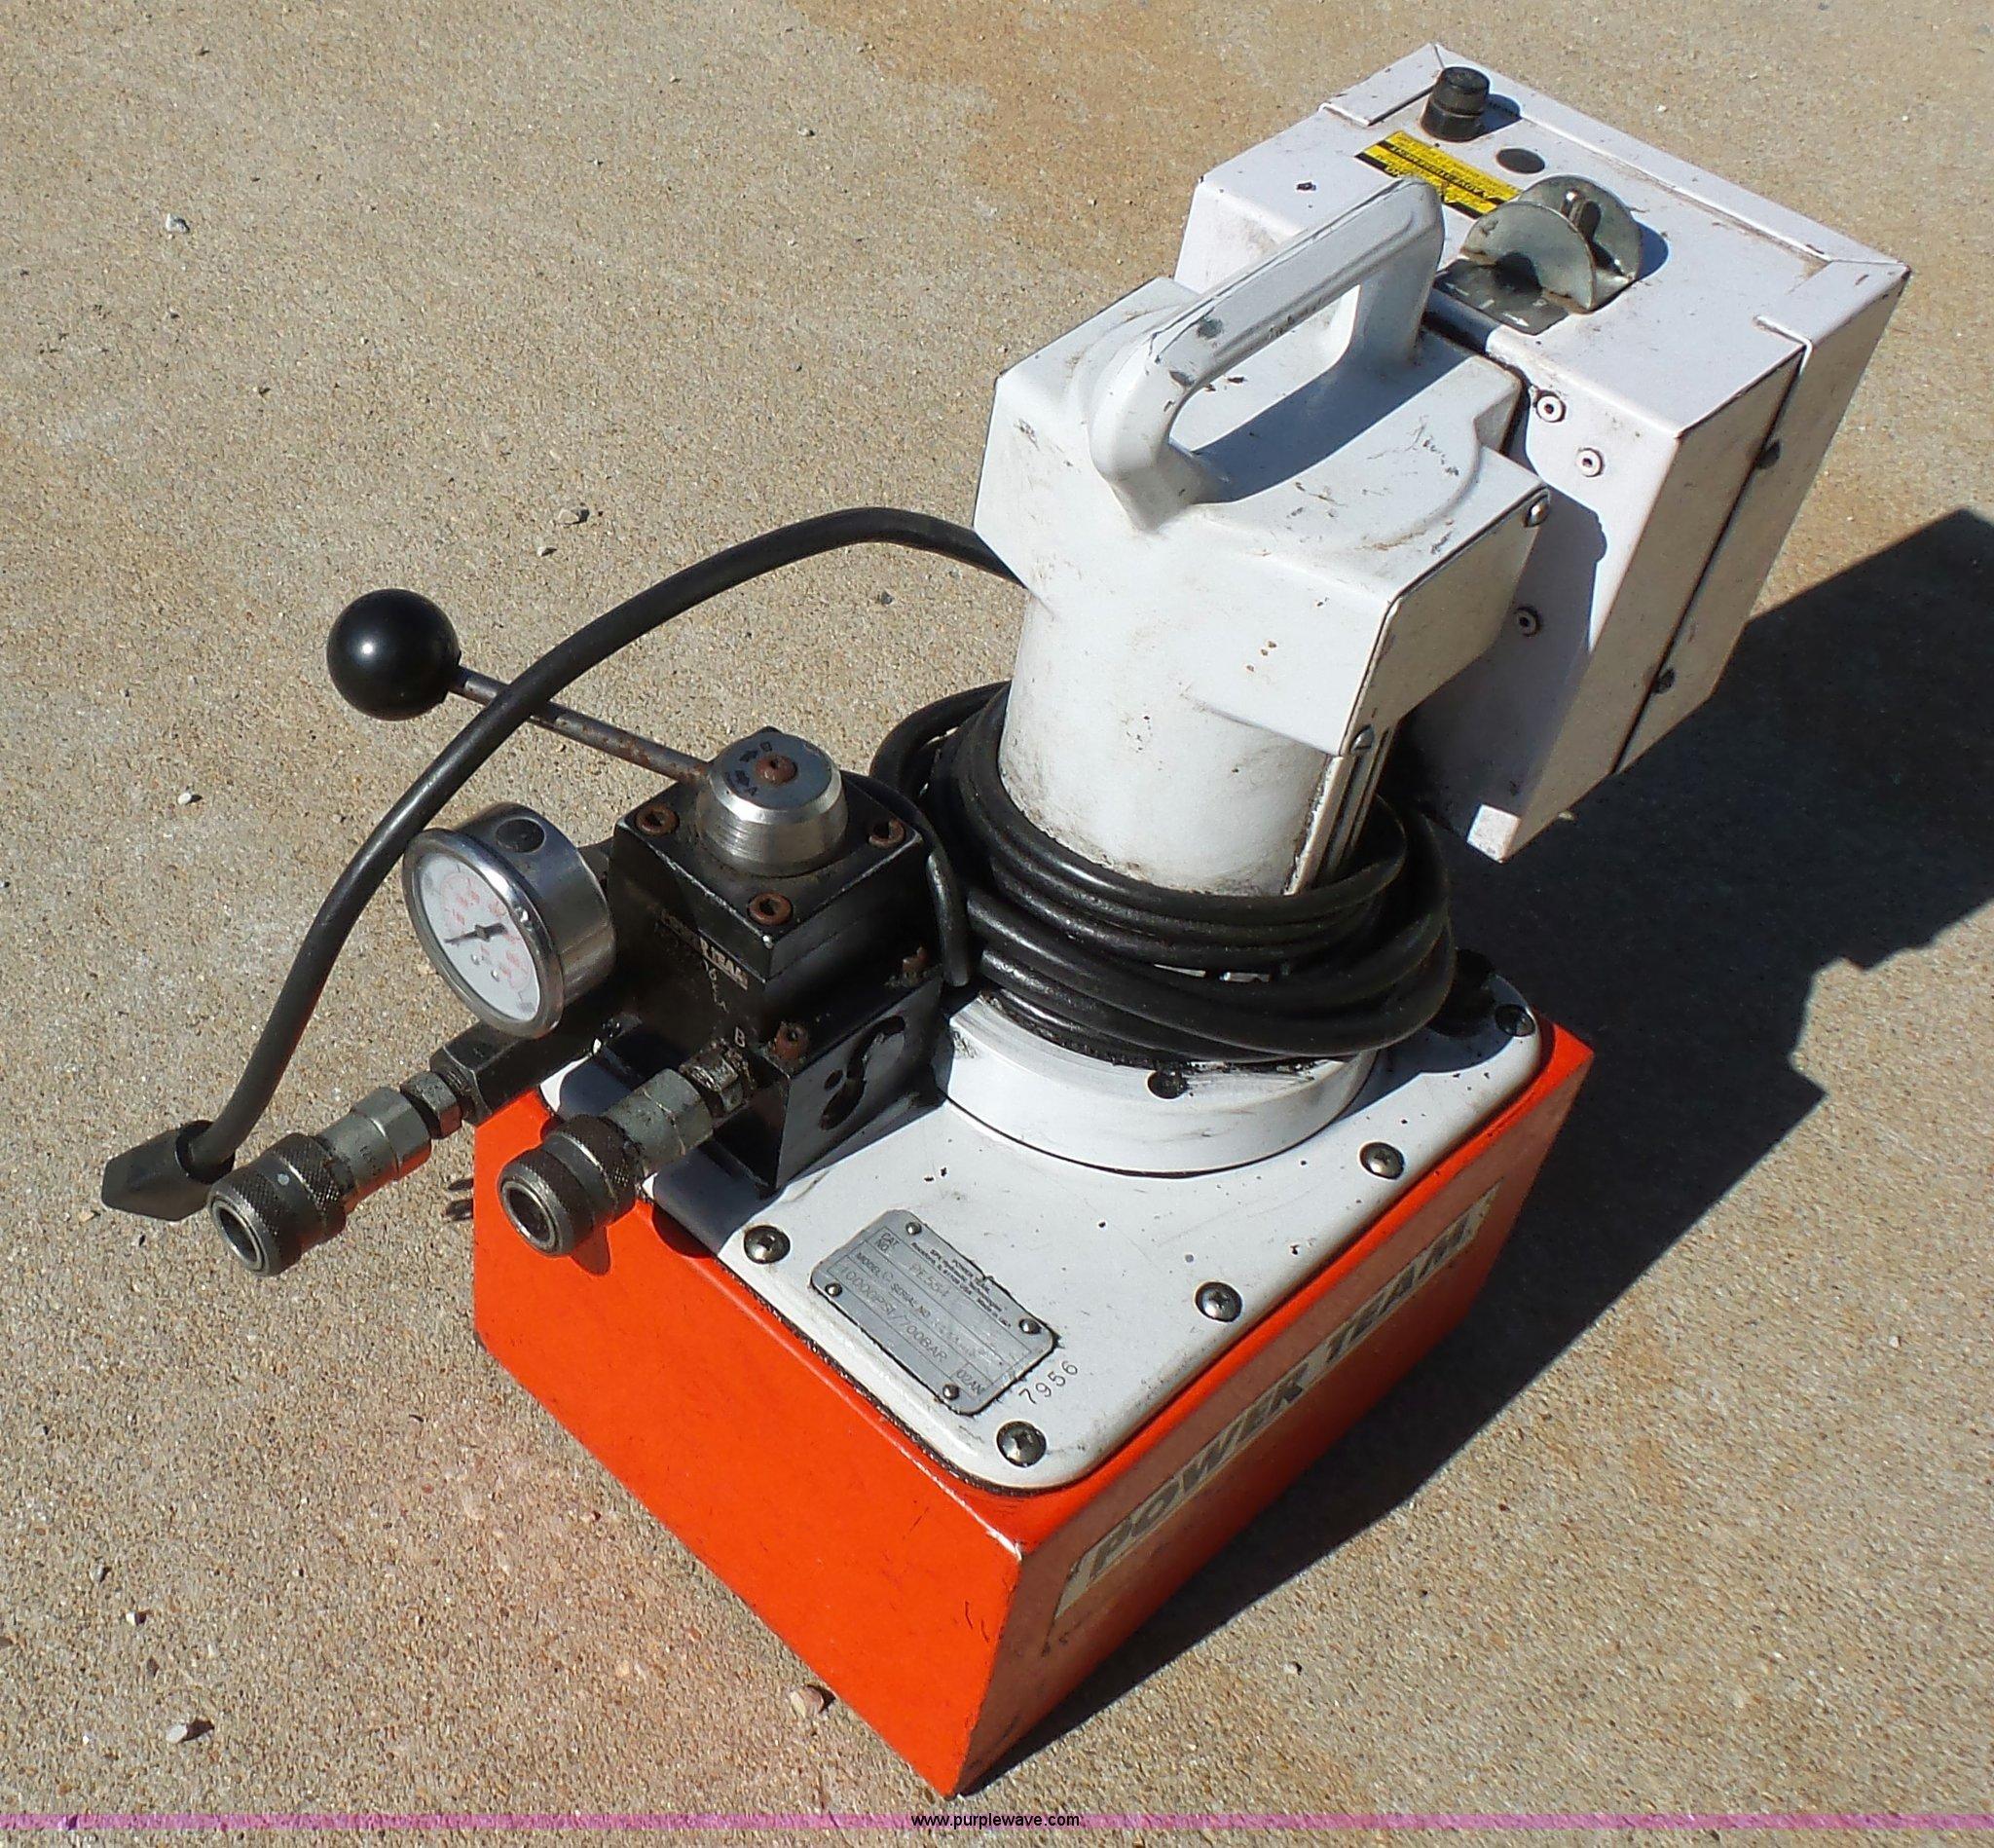 Power Team PE554 hydraulic pump   Item BN9505   SOLD! June 9